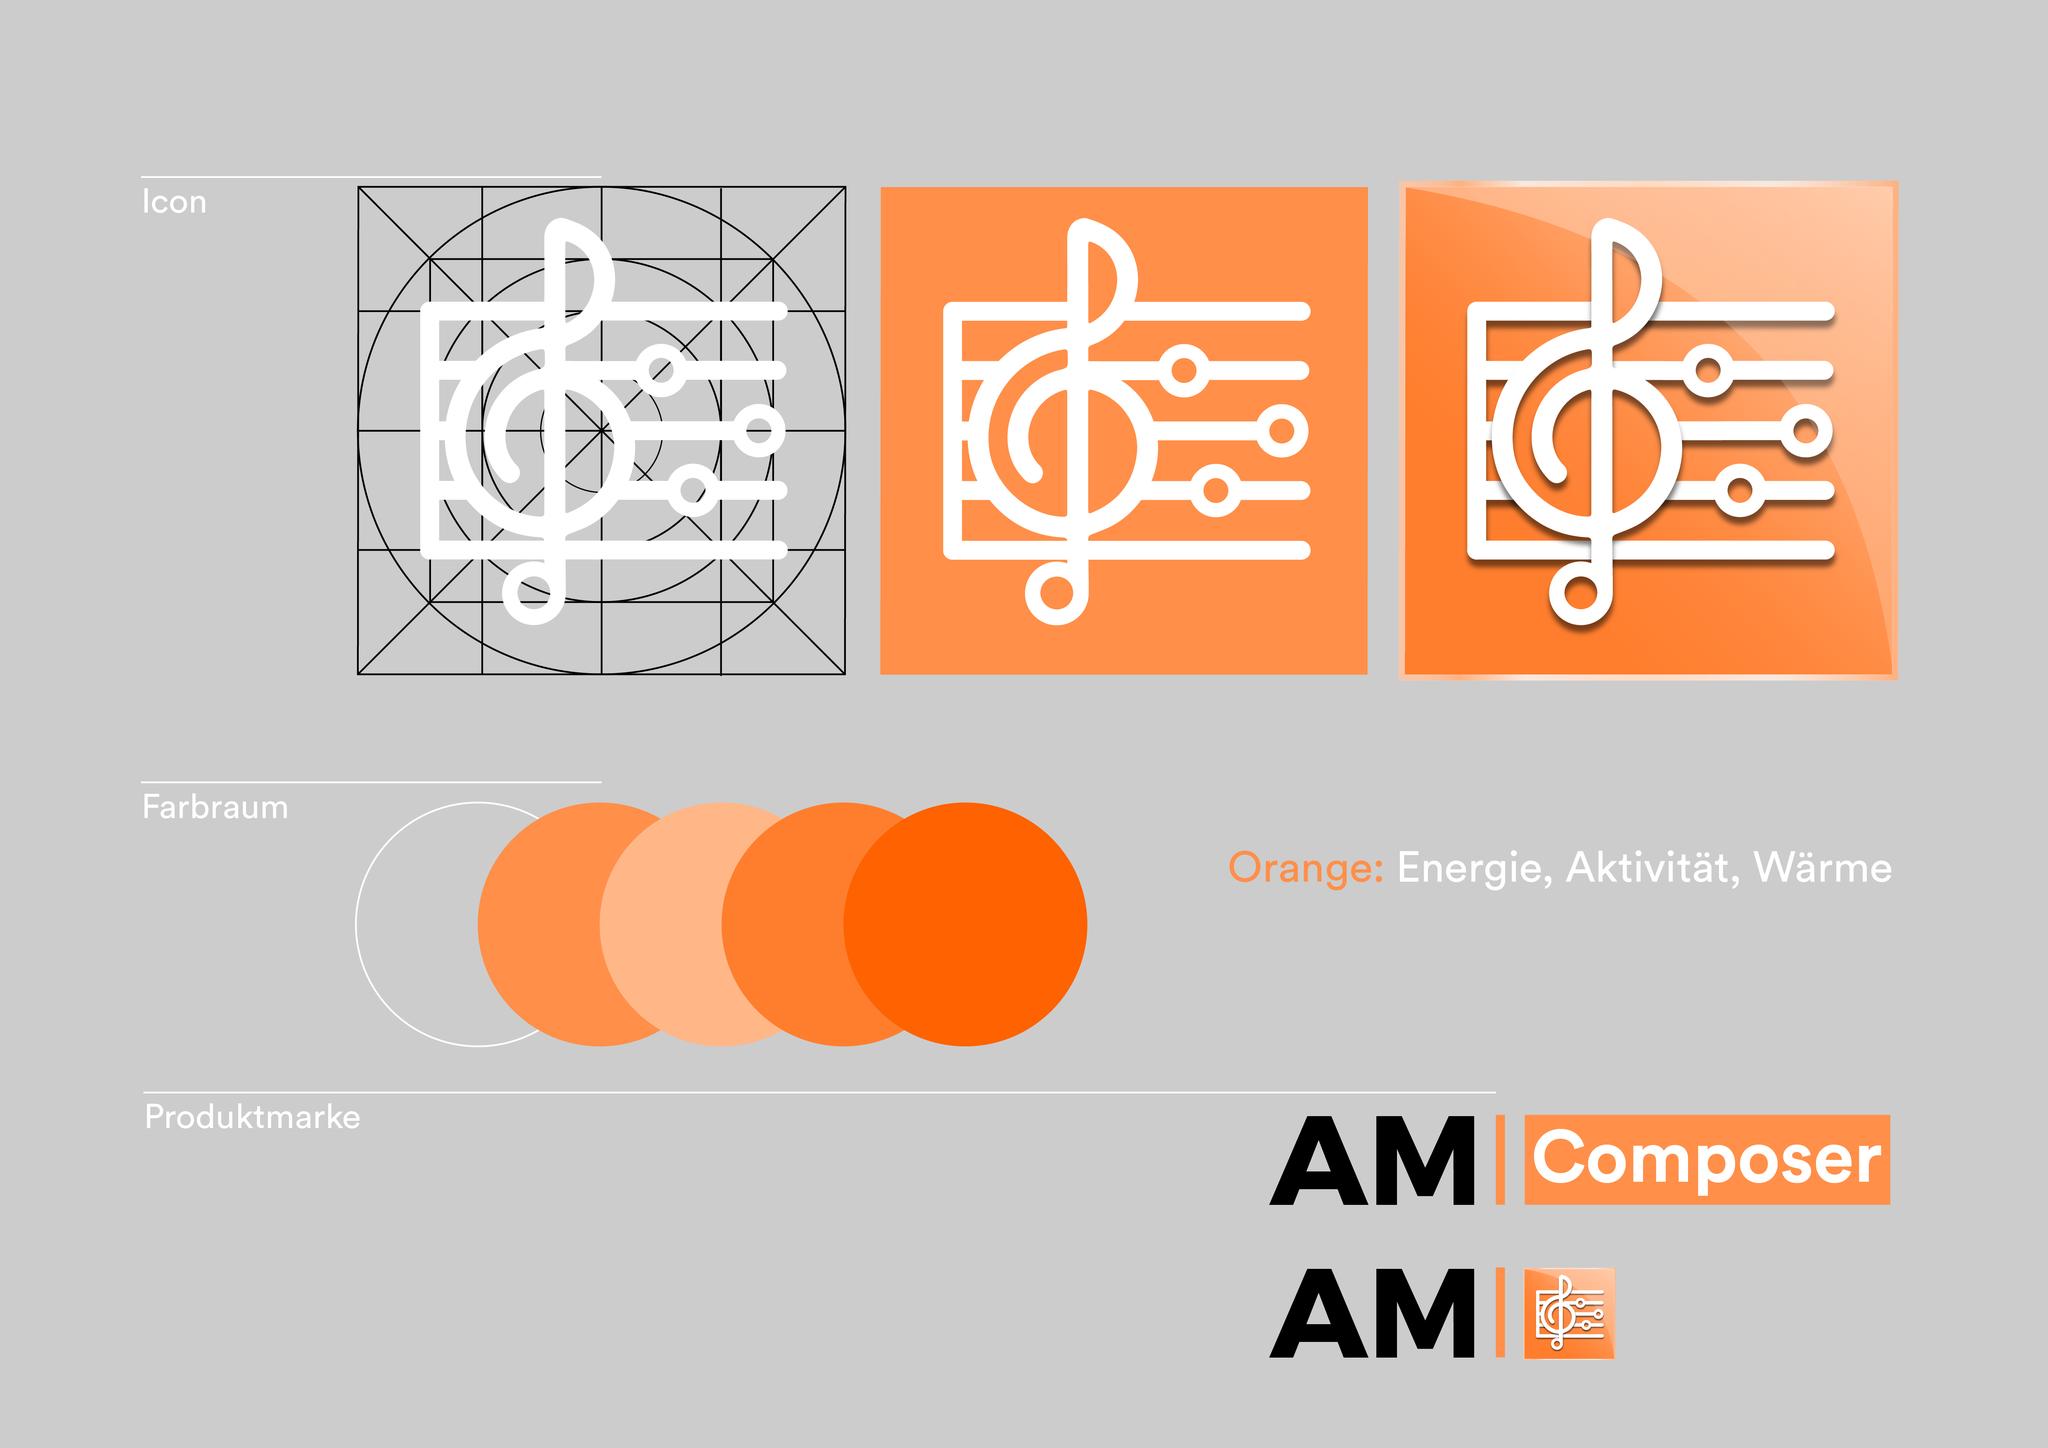 Produkt AM Composer